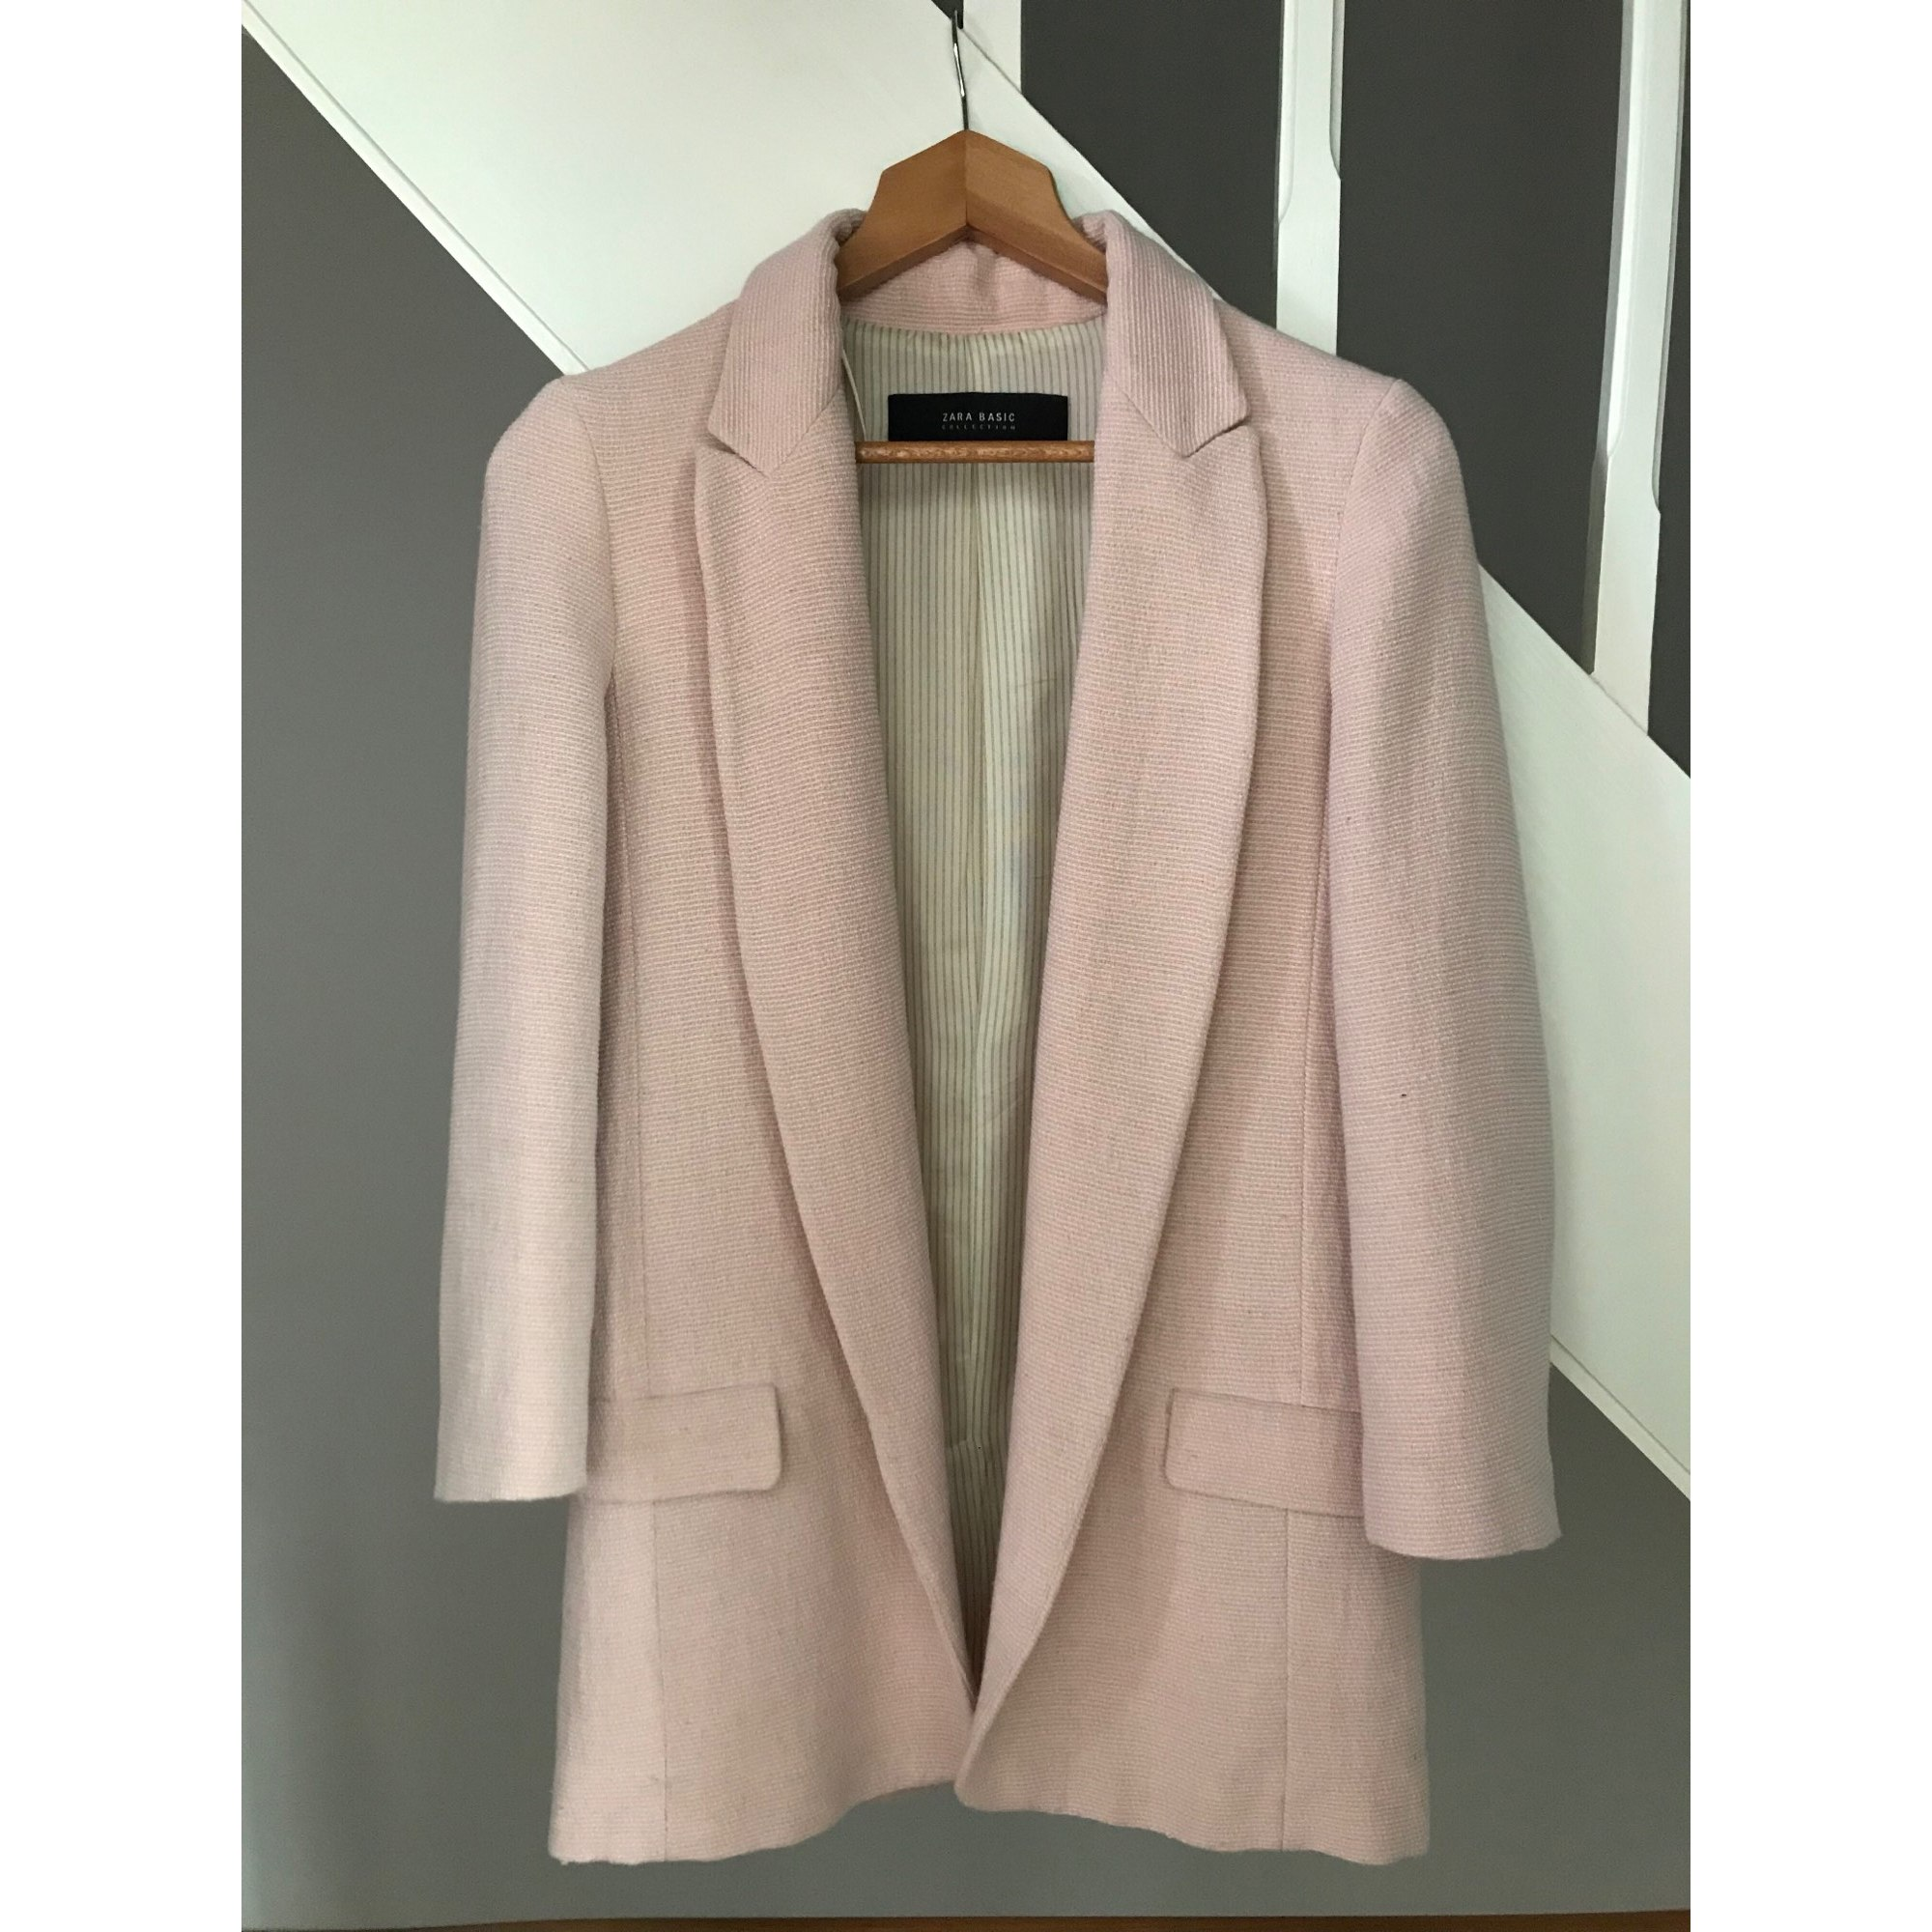 Blazer, veste tailleur ZARA 34 (XS, T0) rose 7588441